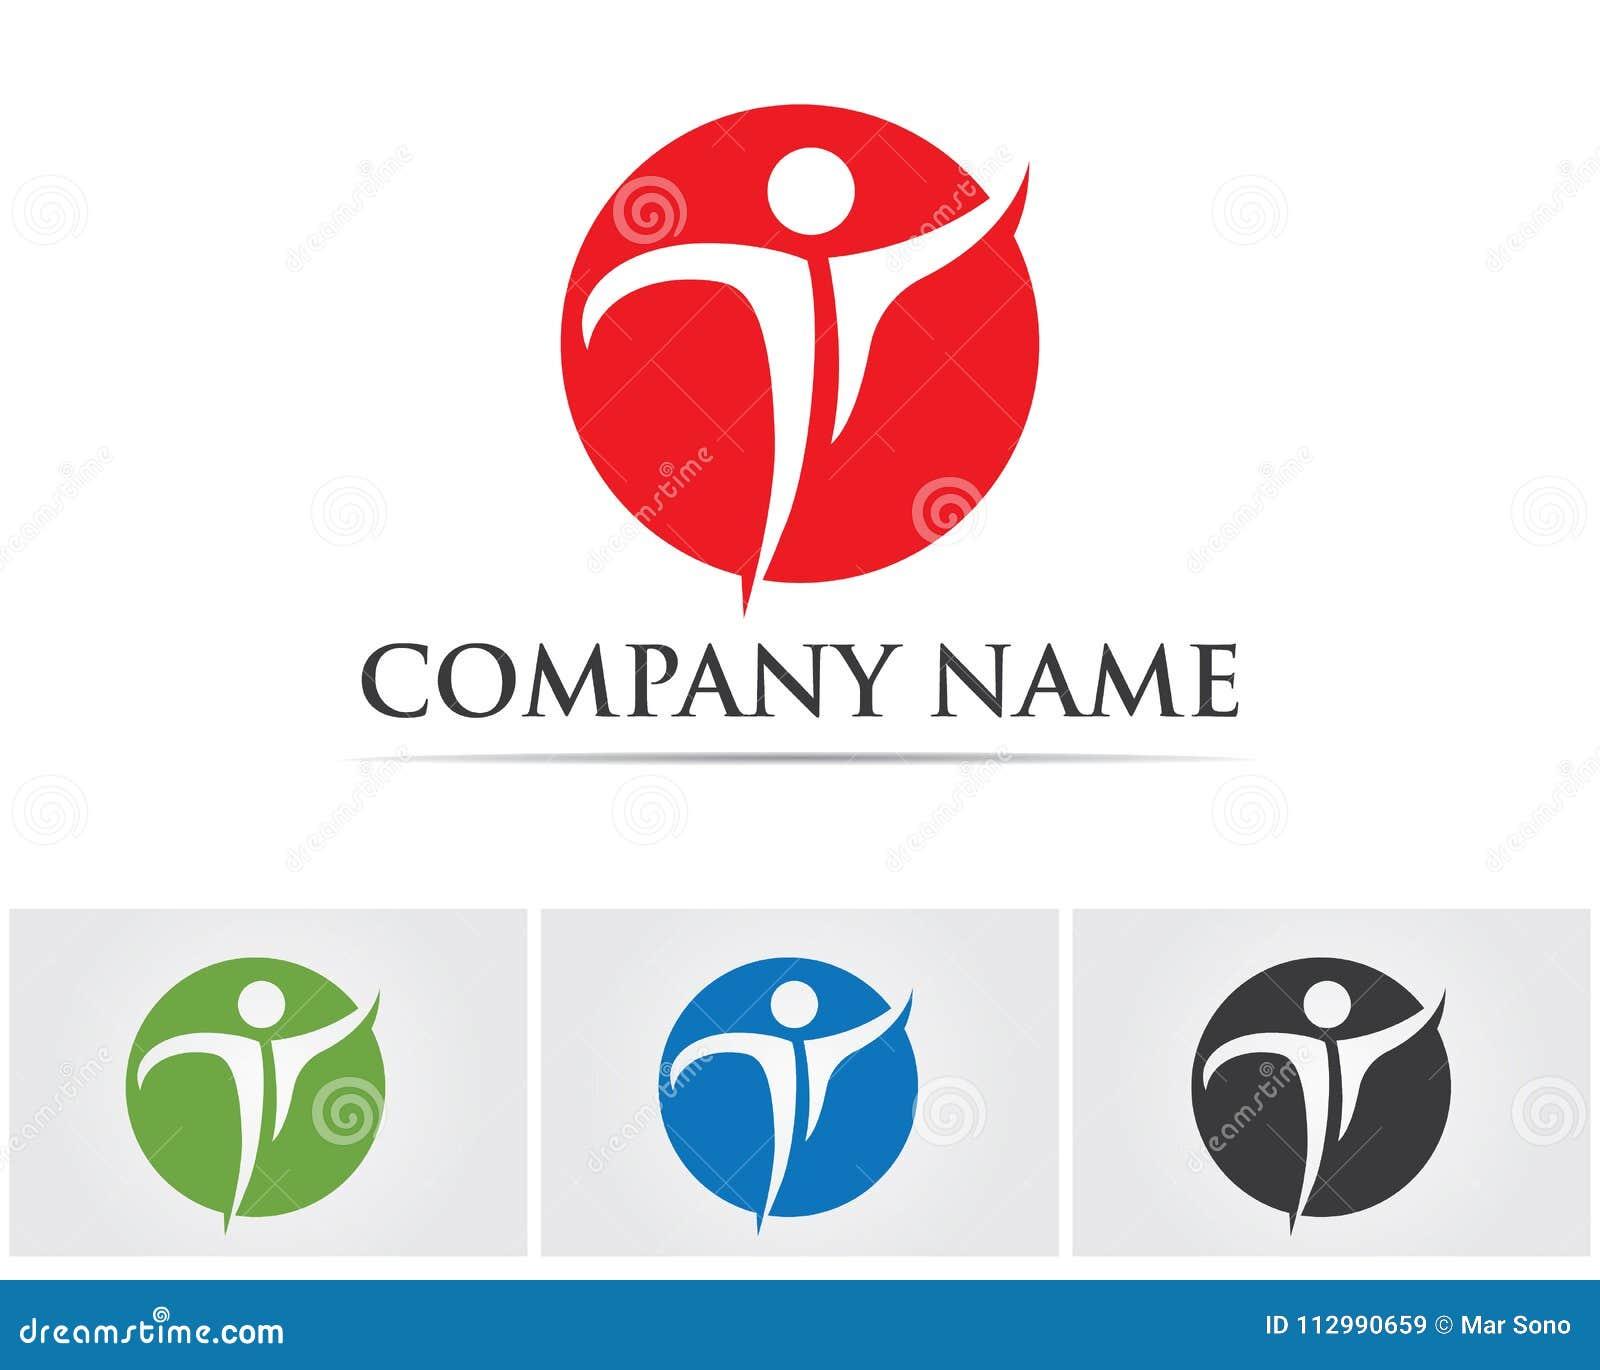 teacher people logo and symbols vector app..